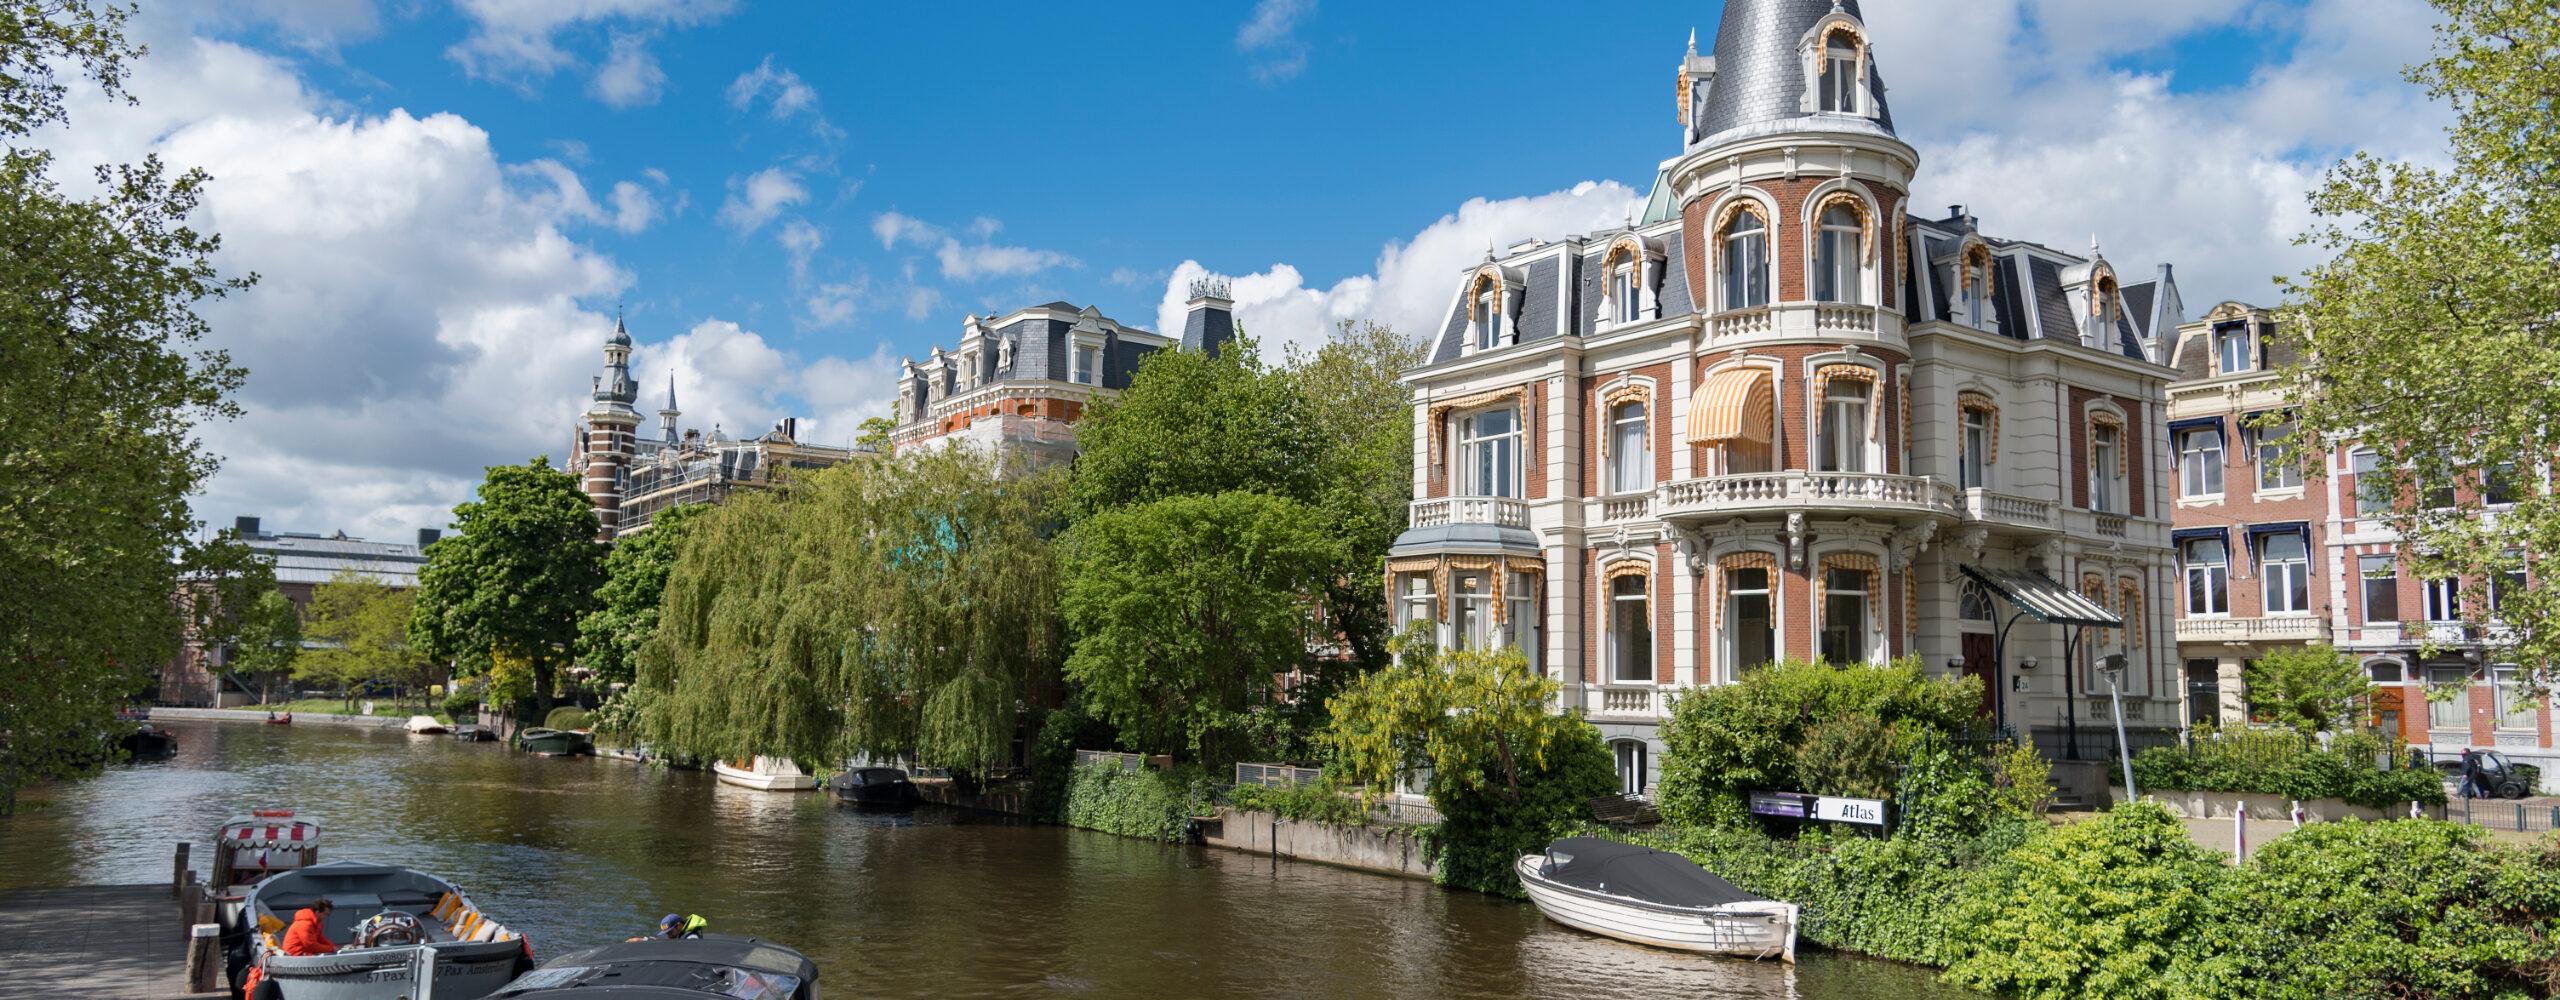 Нидерланды. Последний день вАмстердаме.